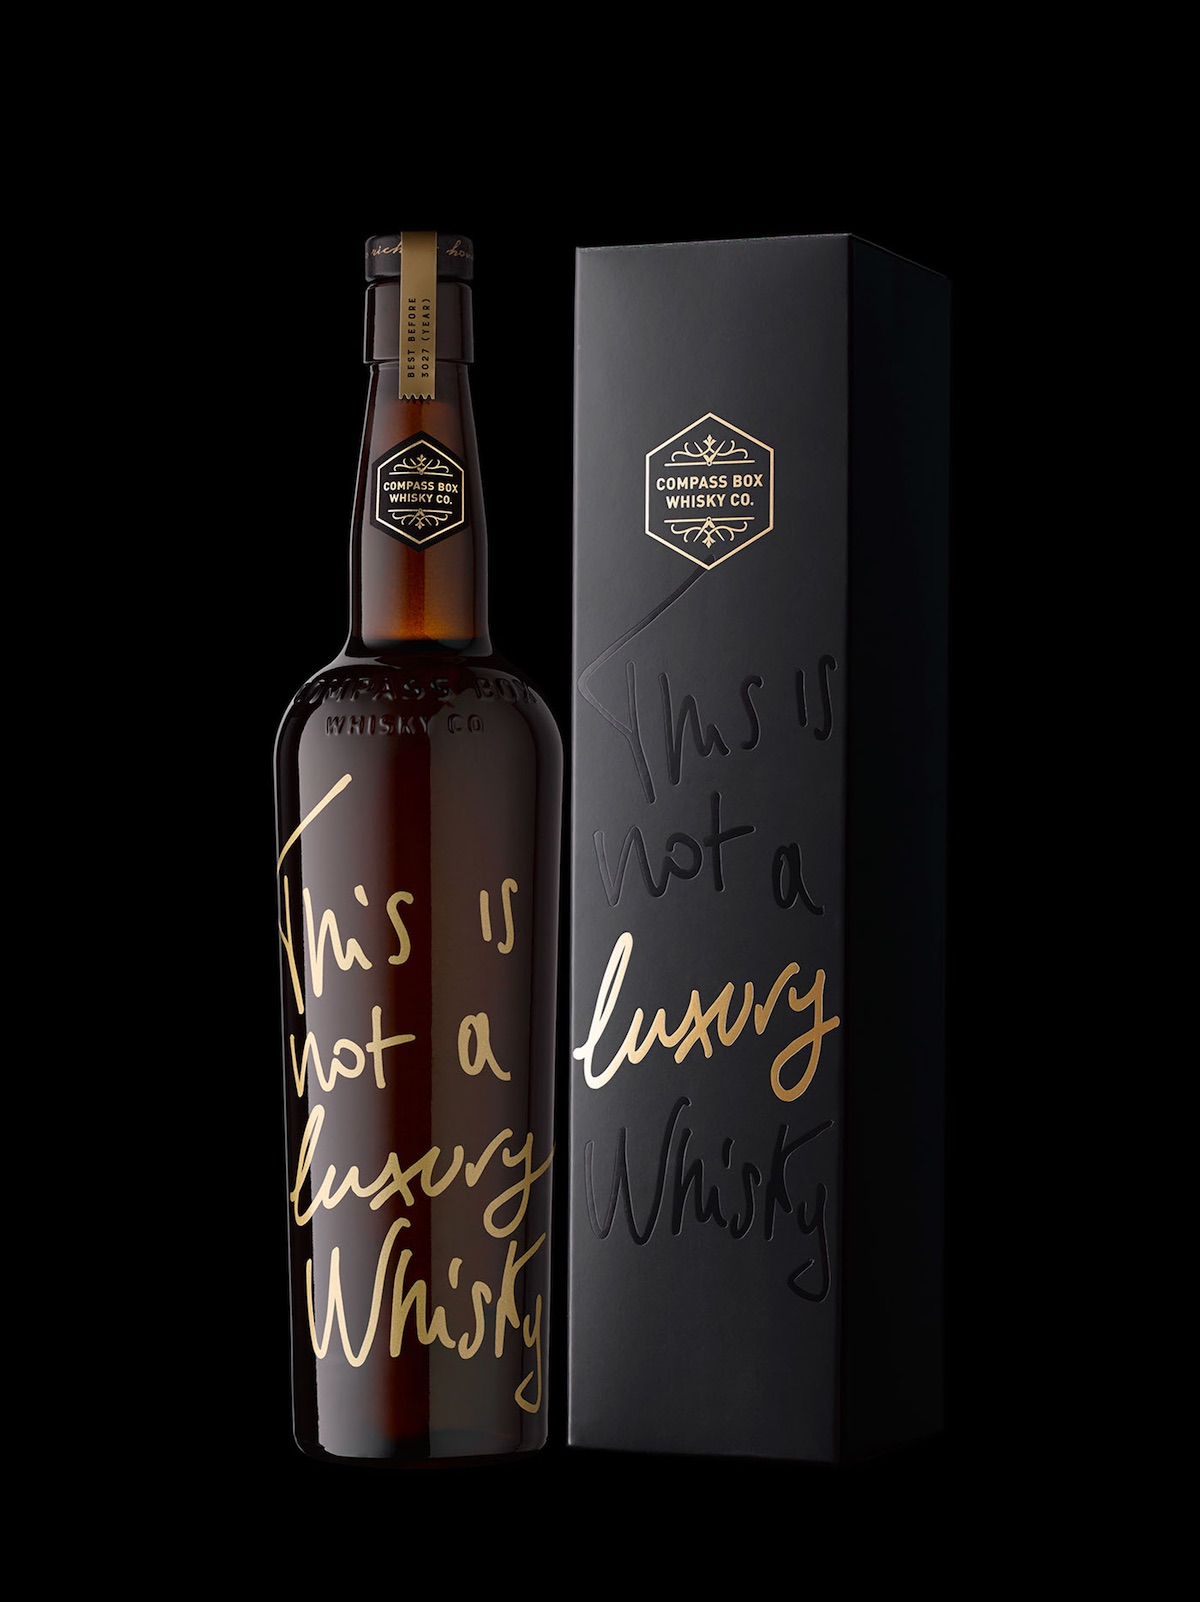 luxury-whisky-packaging-1-1